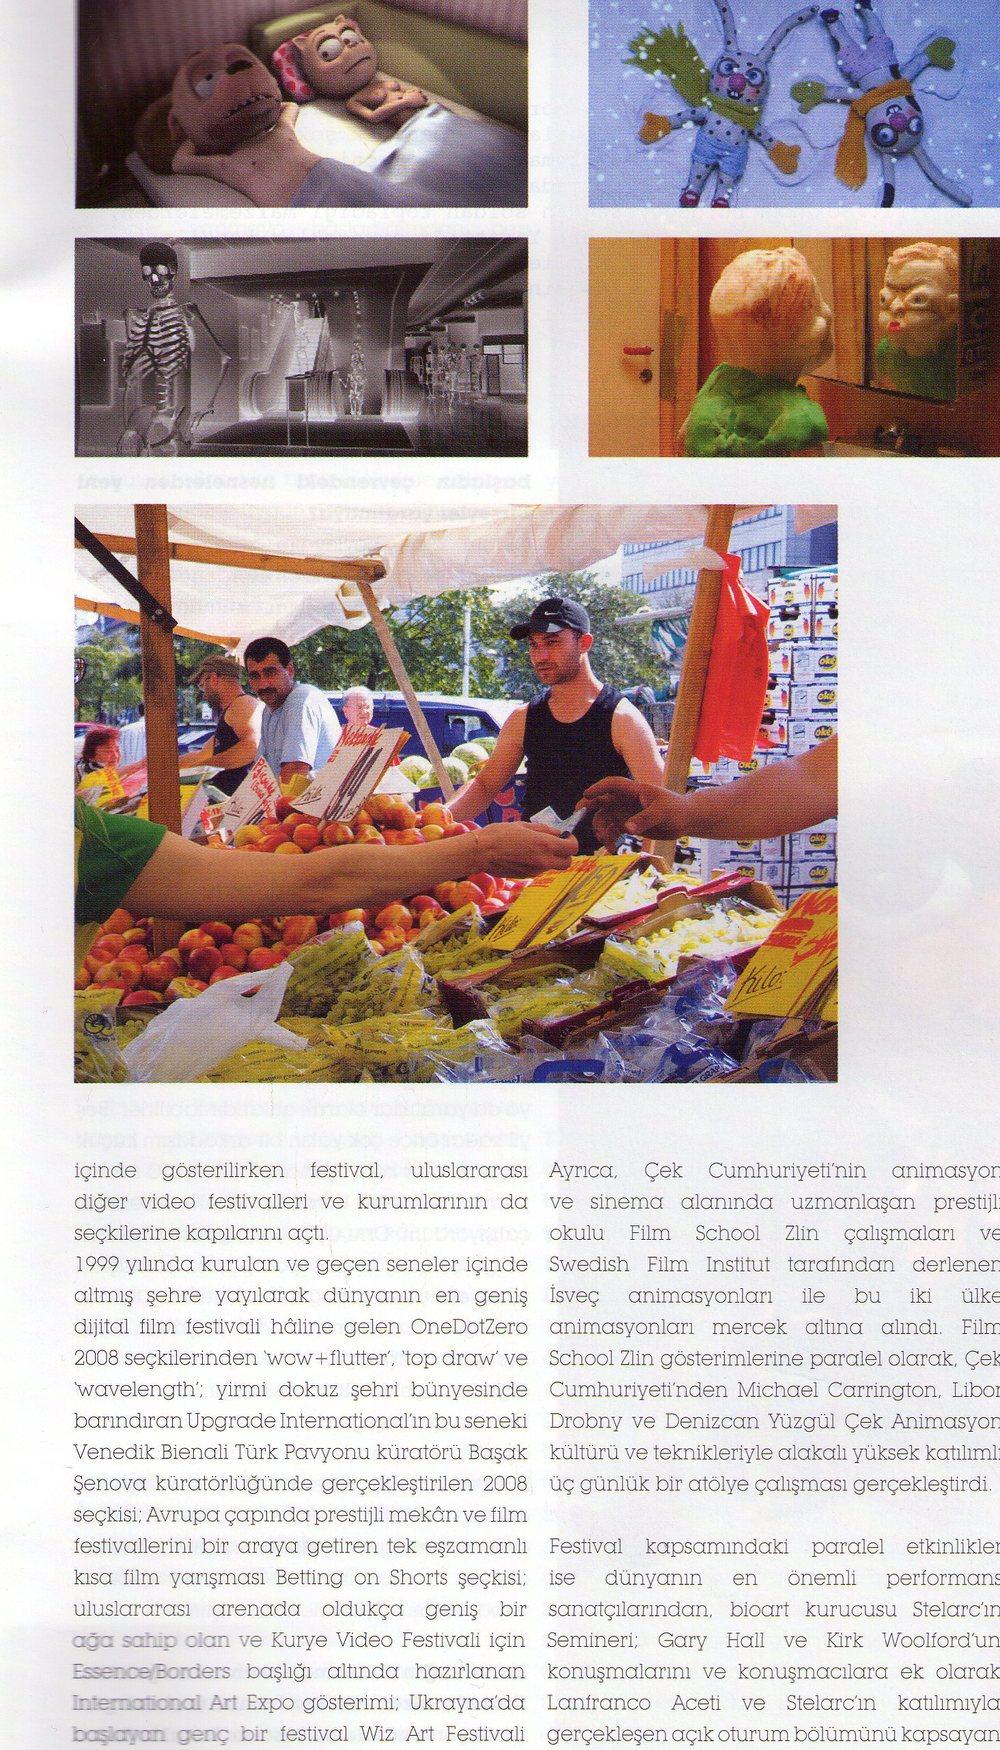 Bant_07-08.2009_haber_6.jpg